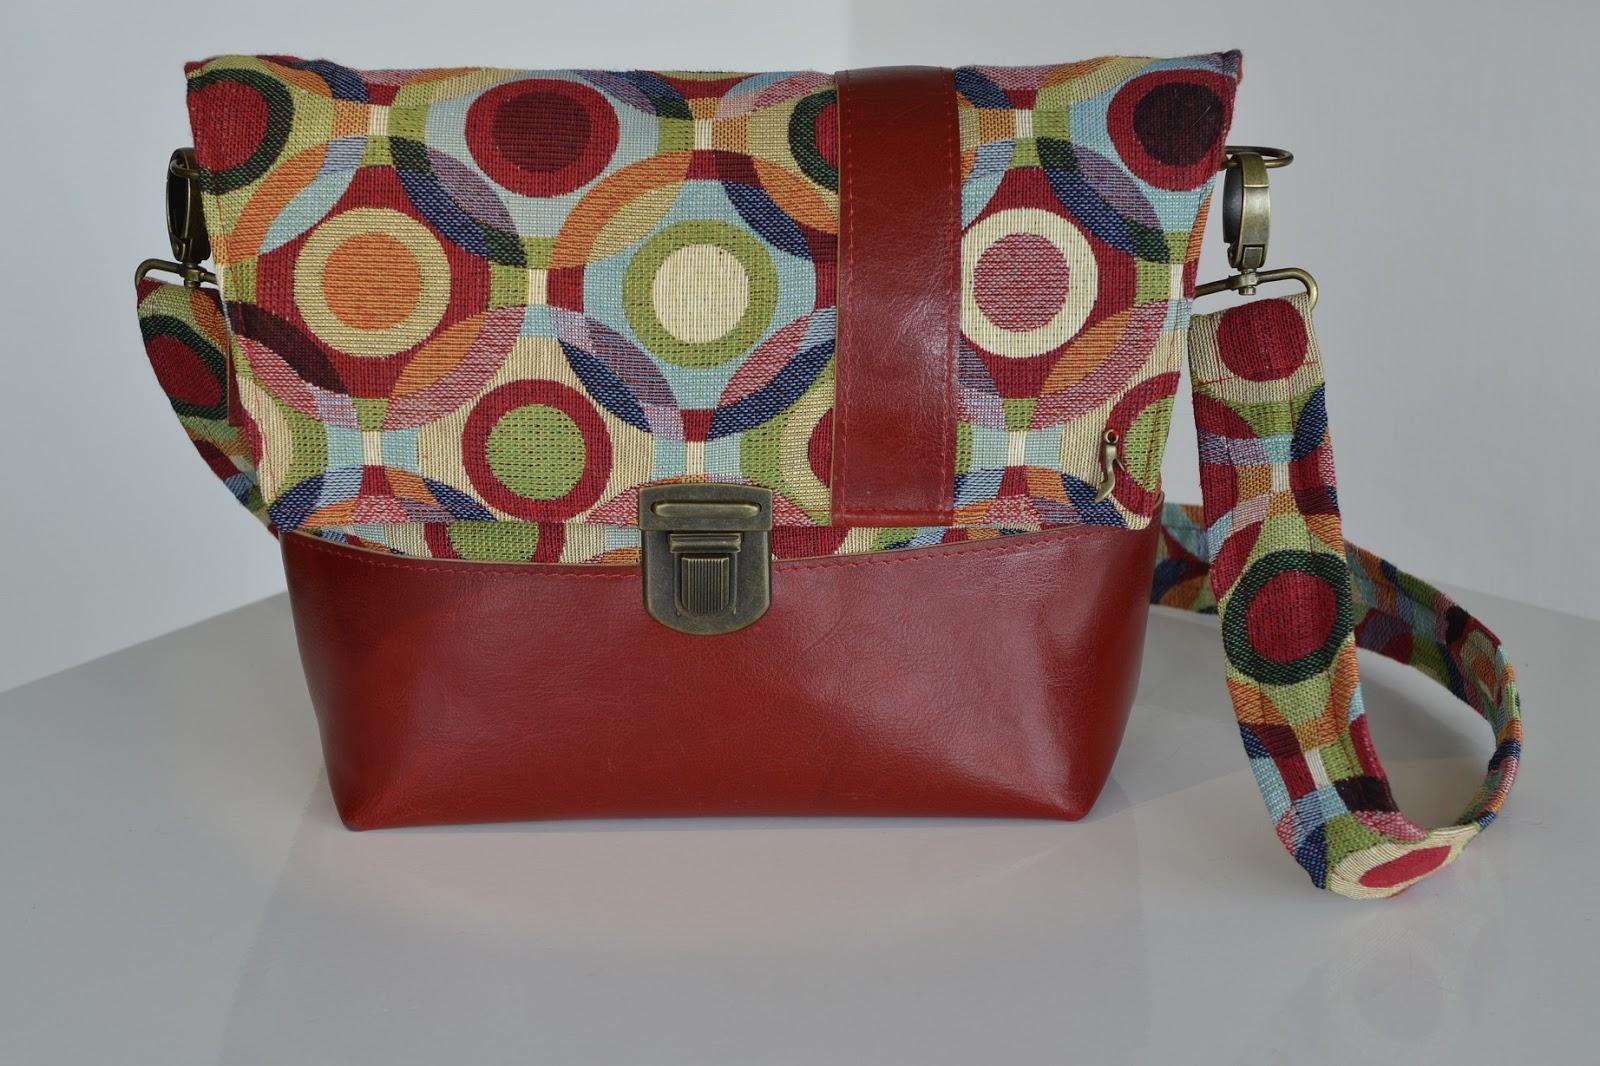 6f5d6db9274 Portfolio Bolsas-Bags - Bolsas Tassen